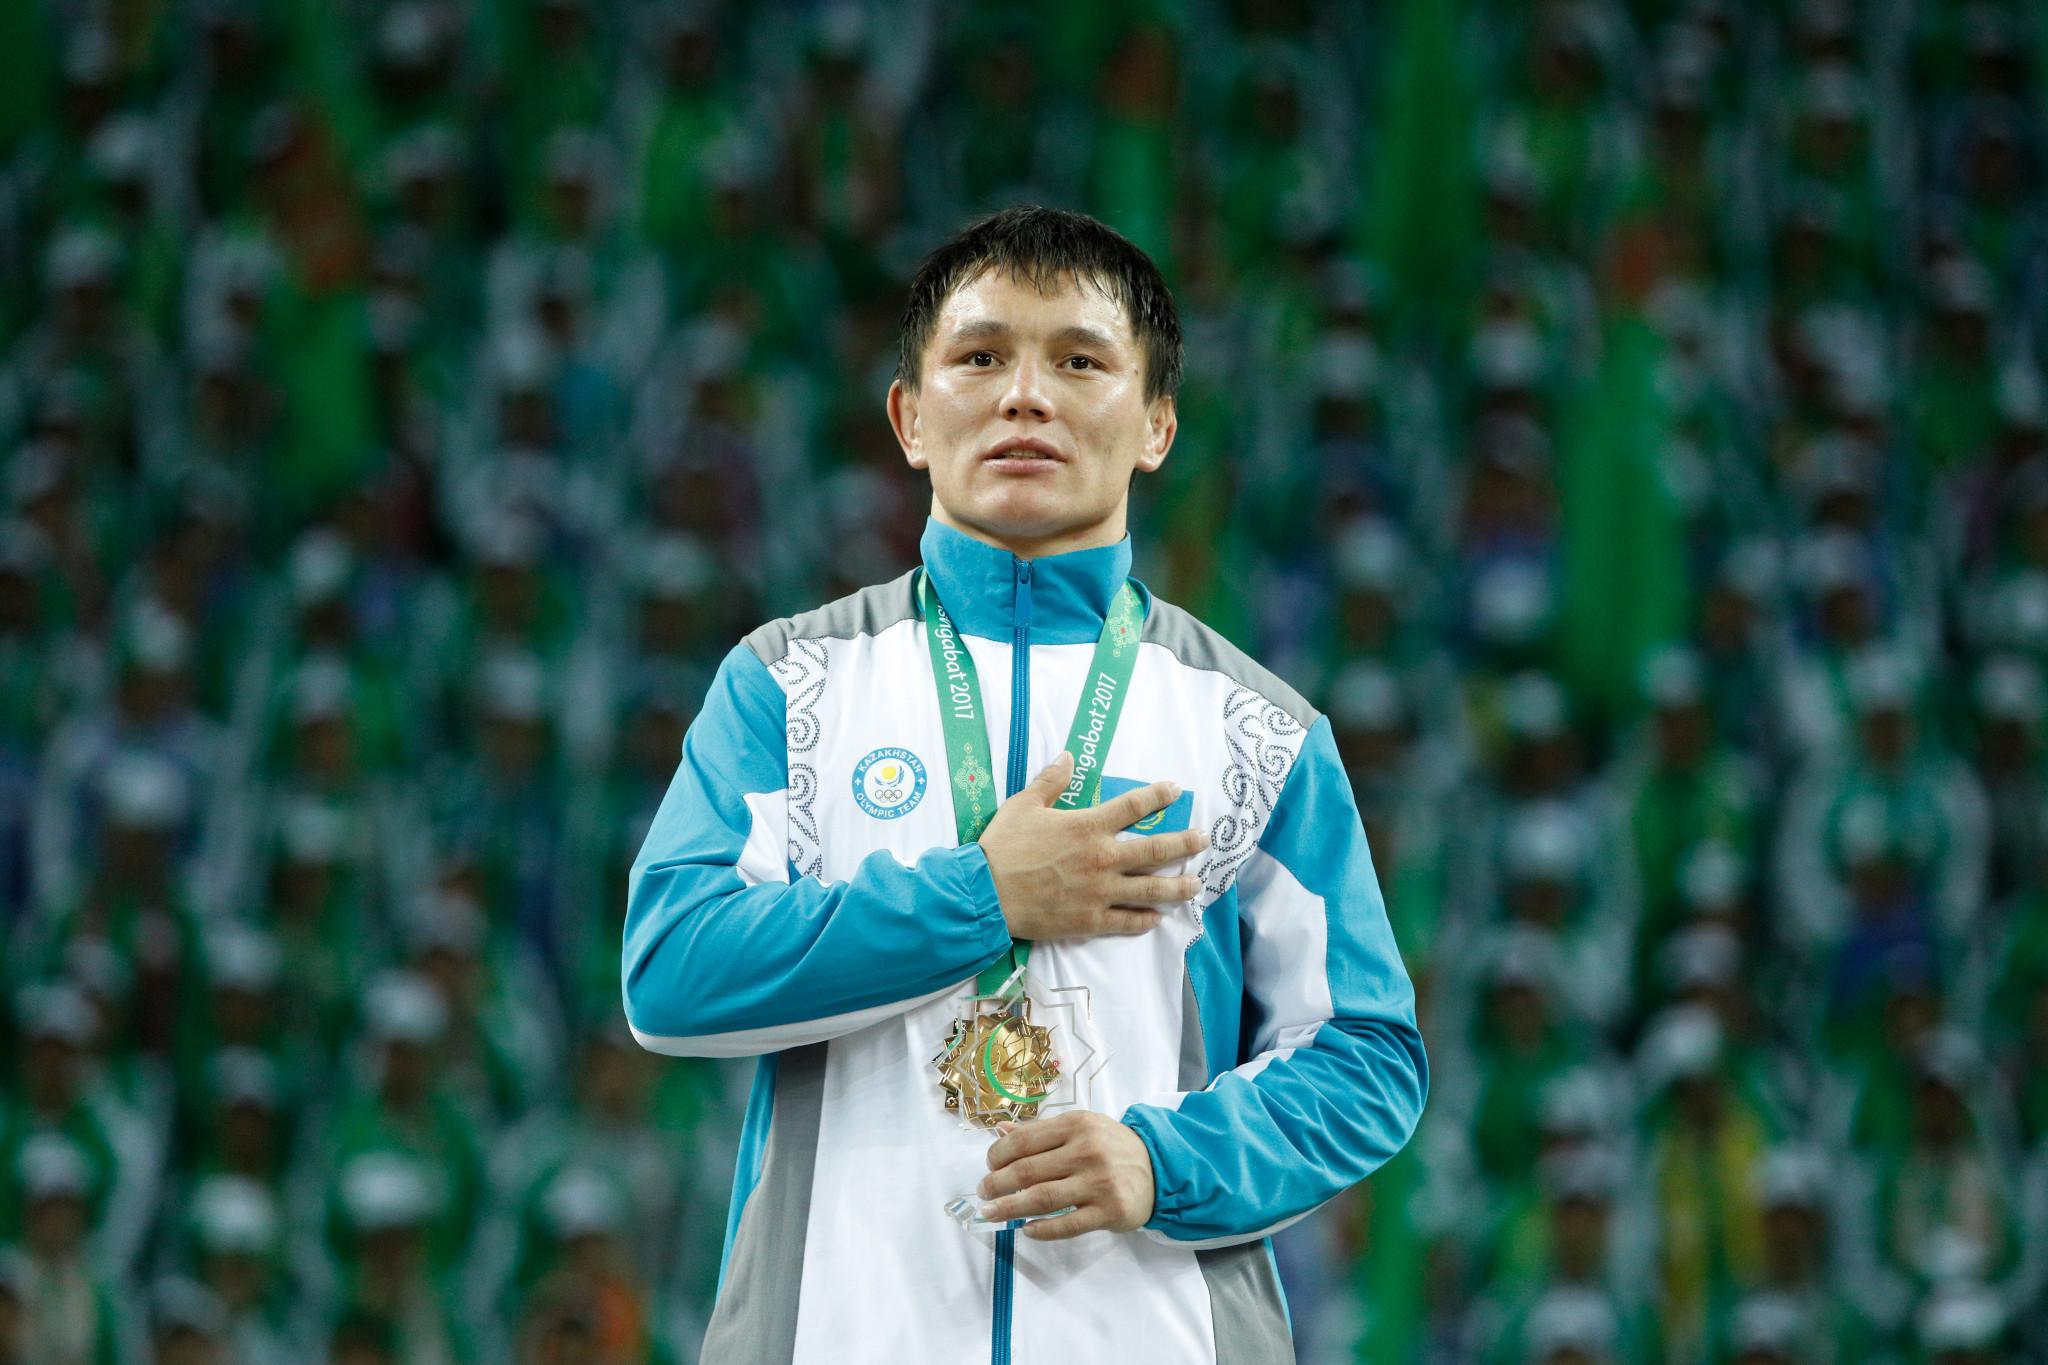 Kazakhstan's Daniyar Kalenov secured the men's under 66kg Greco-Roman wrestling gold medal ©Ashgabat 2017/Konstantinos Tsakalidis/Laurel Photo Services